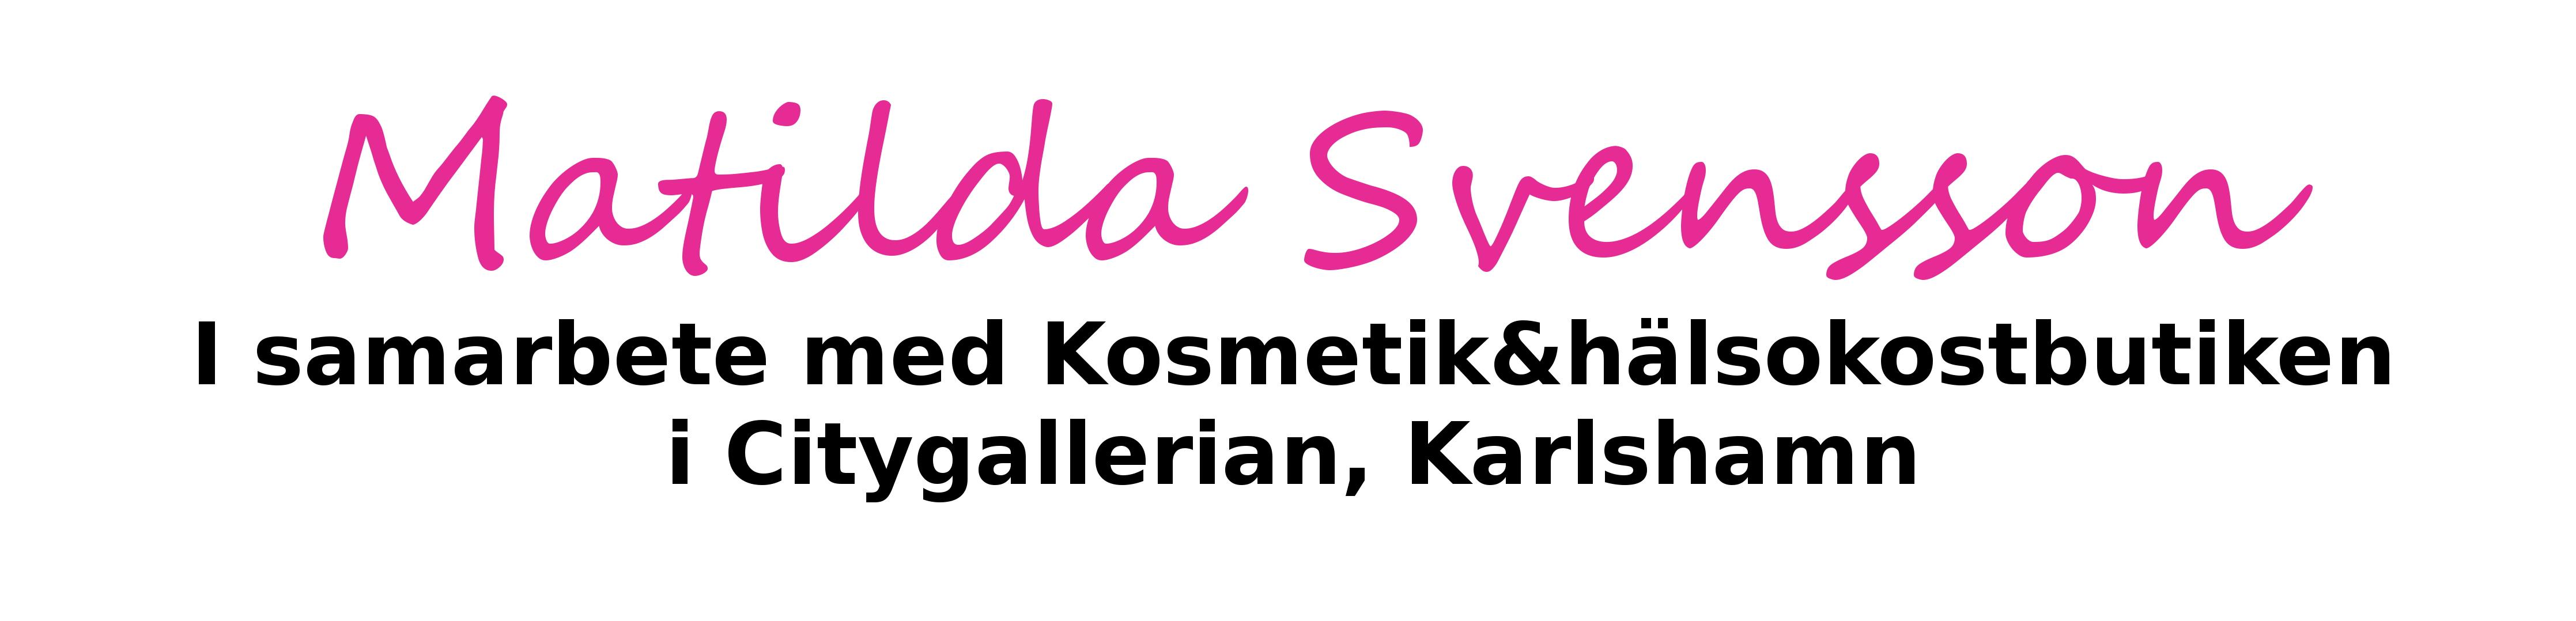 msn dejting Karlshamn